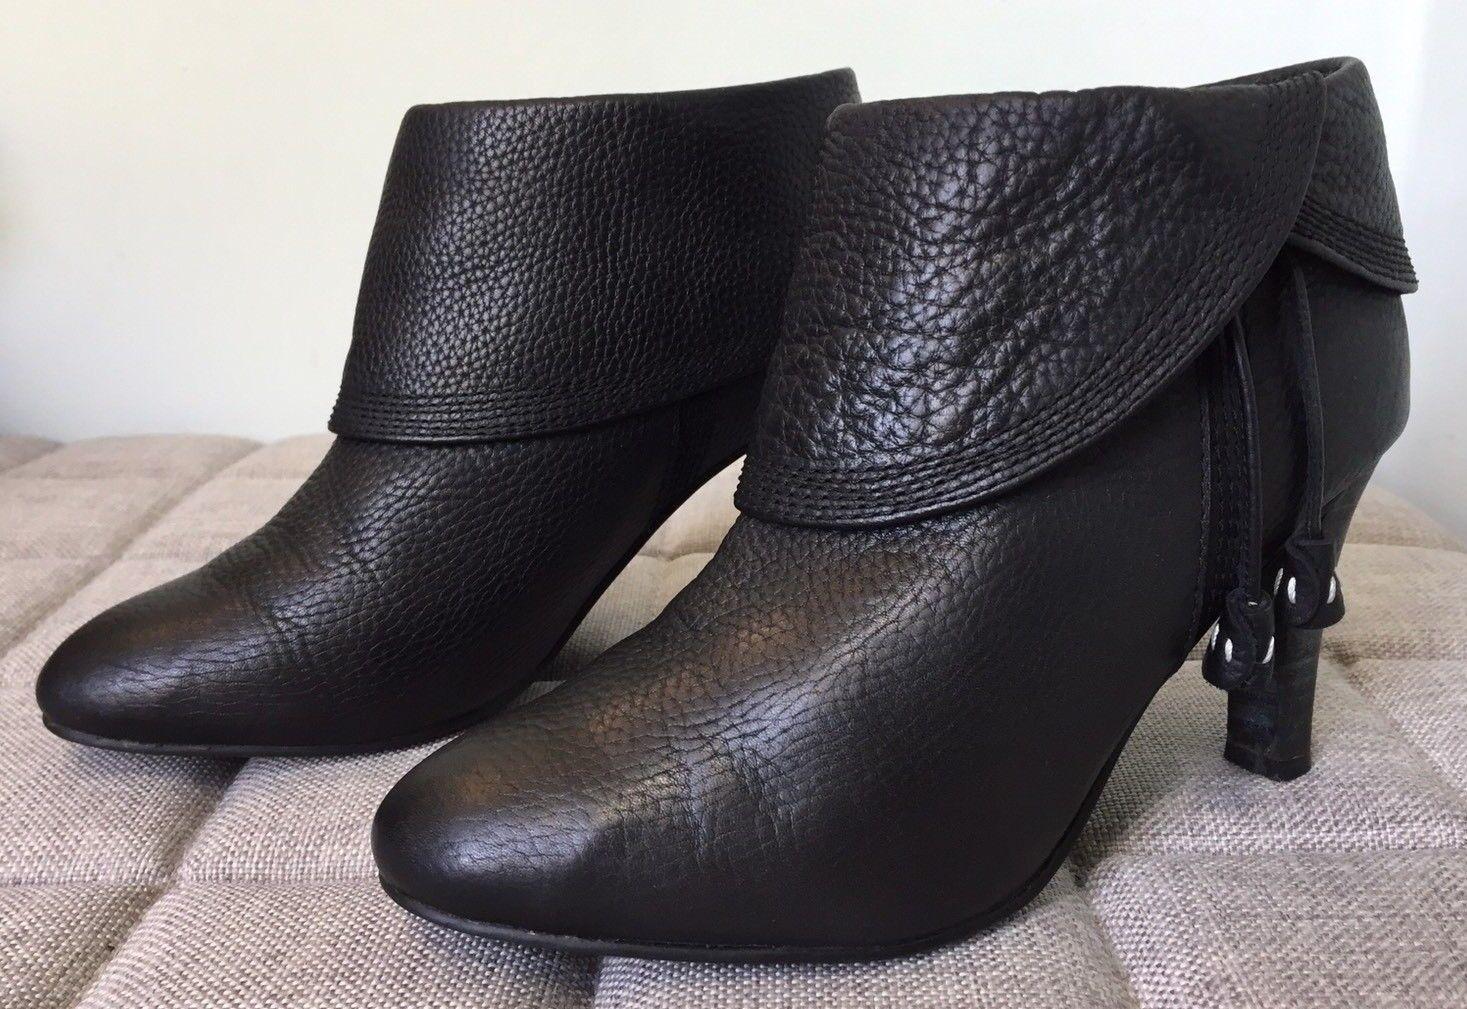 F-TROUPE Black Textured Leather Ankle Boots UK 7 EU 40 Tassels Mid Heel